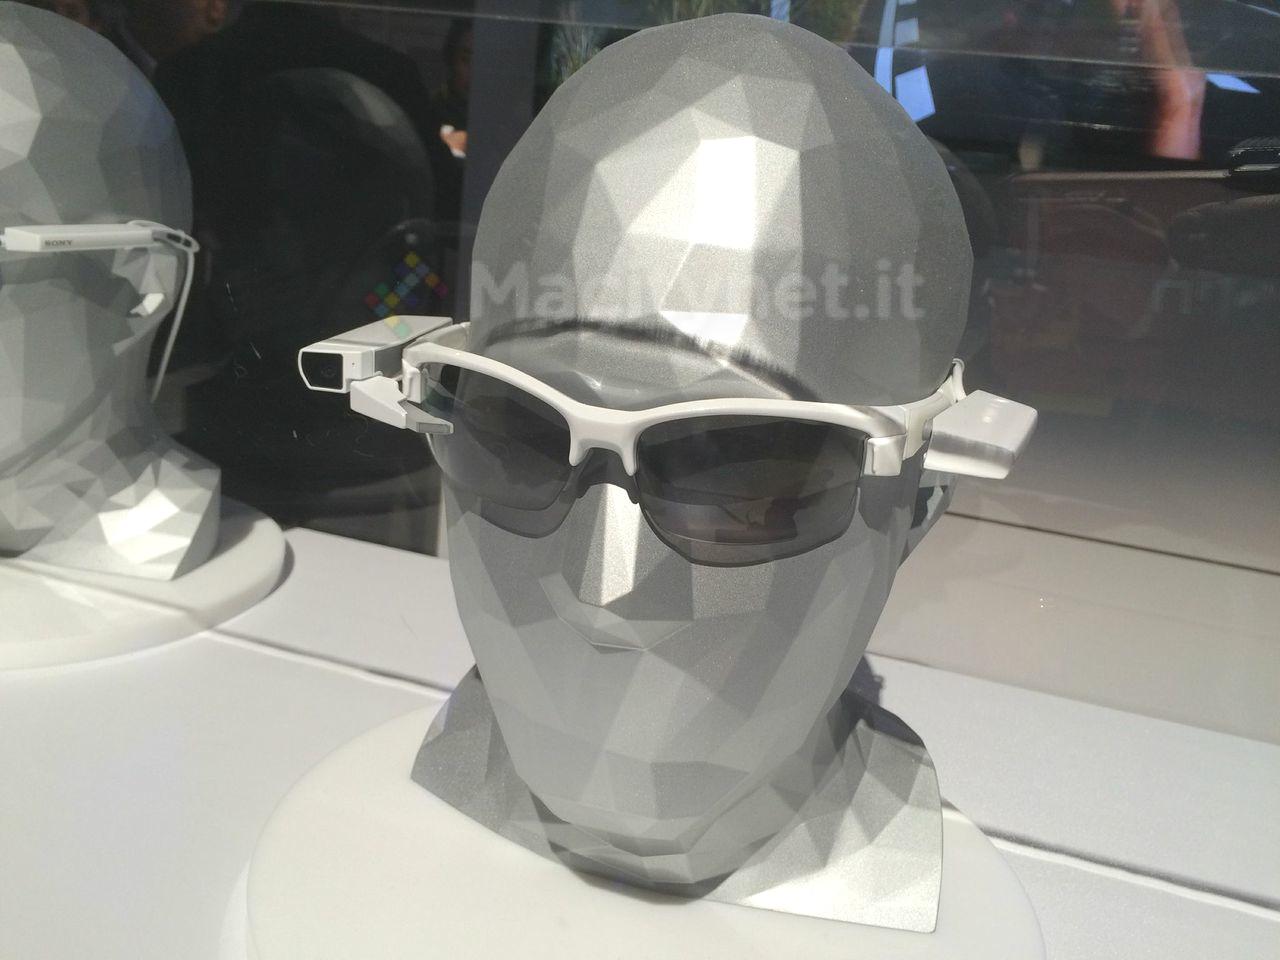 Sony SmartEyeglass Attach 4